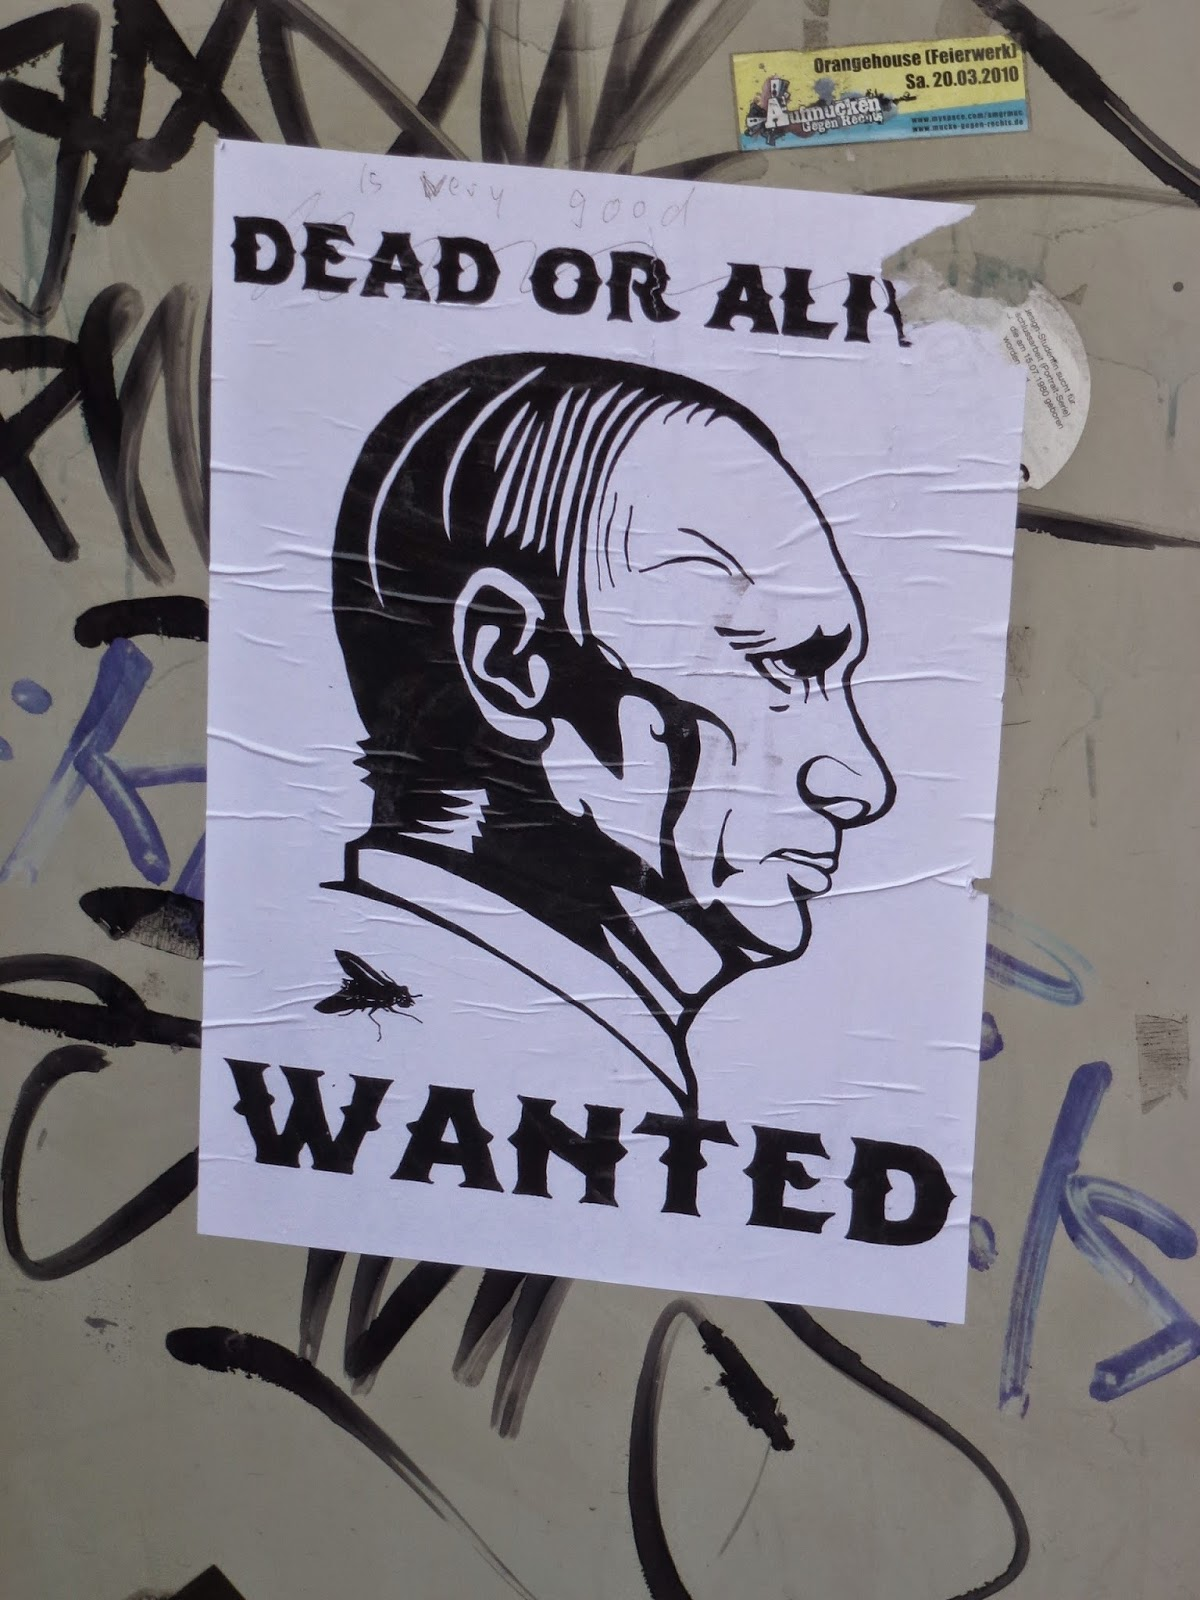 Dead or Alive, Wanted, Putin,Poster, Schulstraße, München